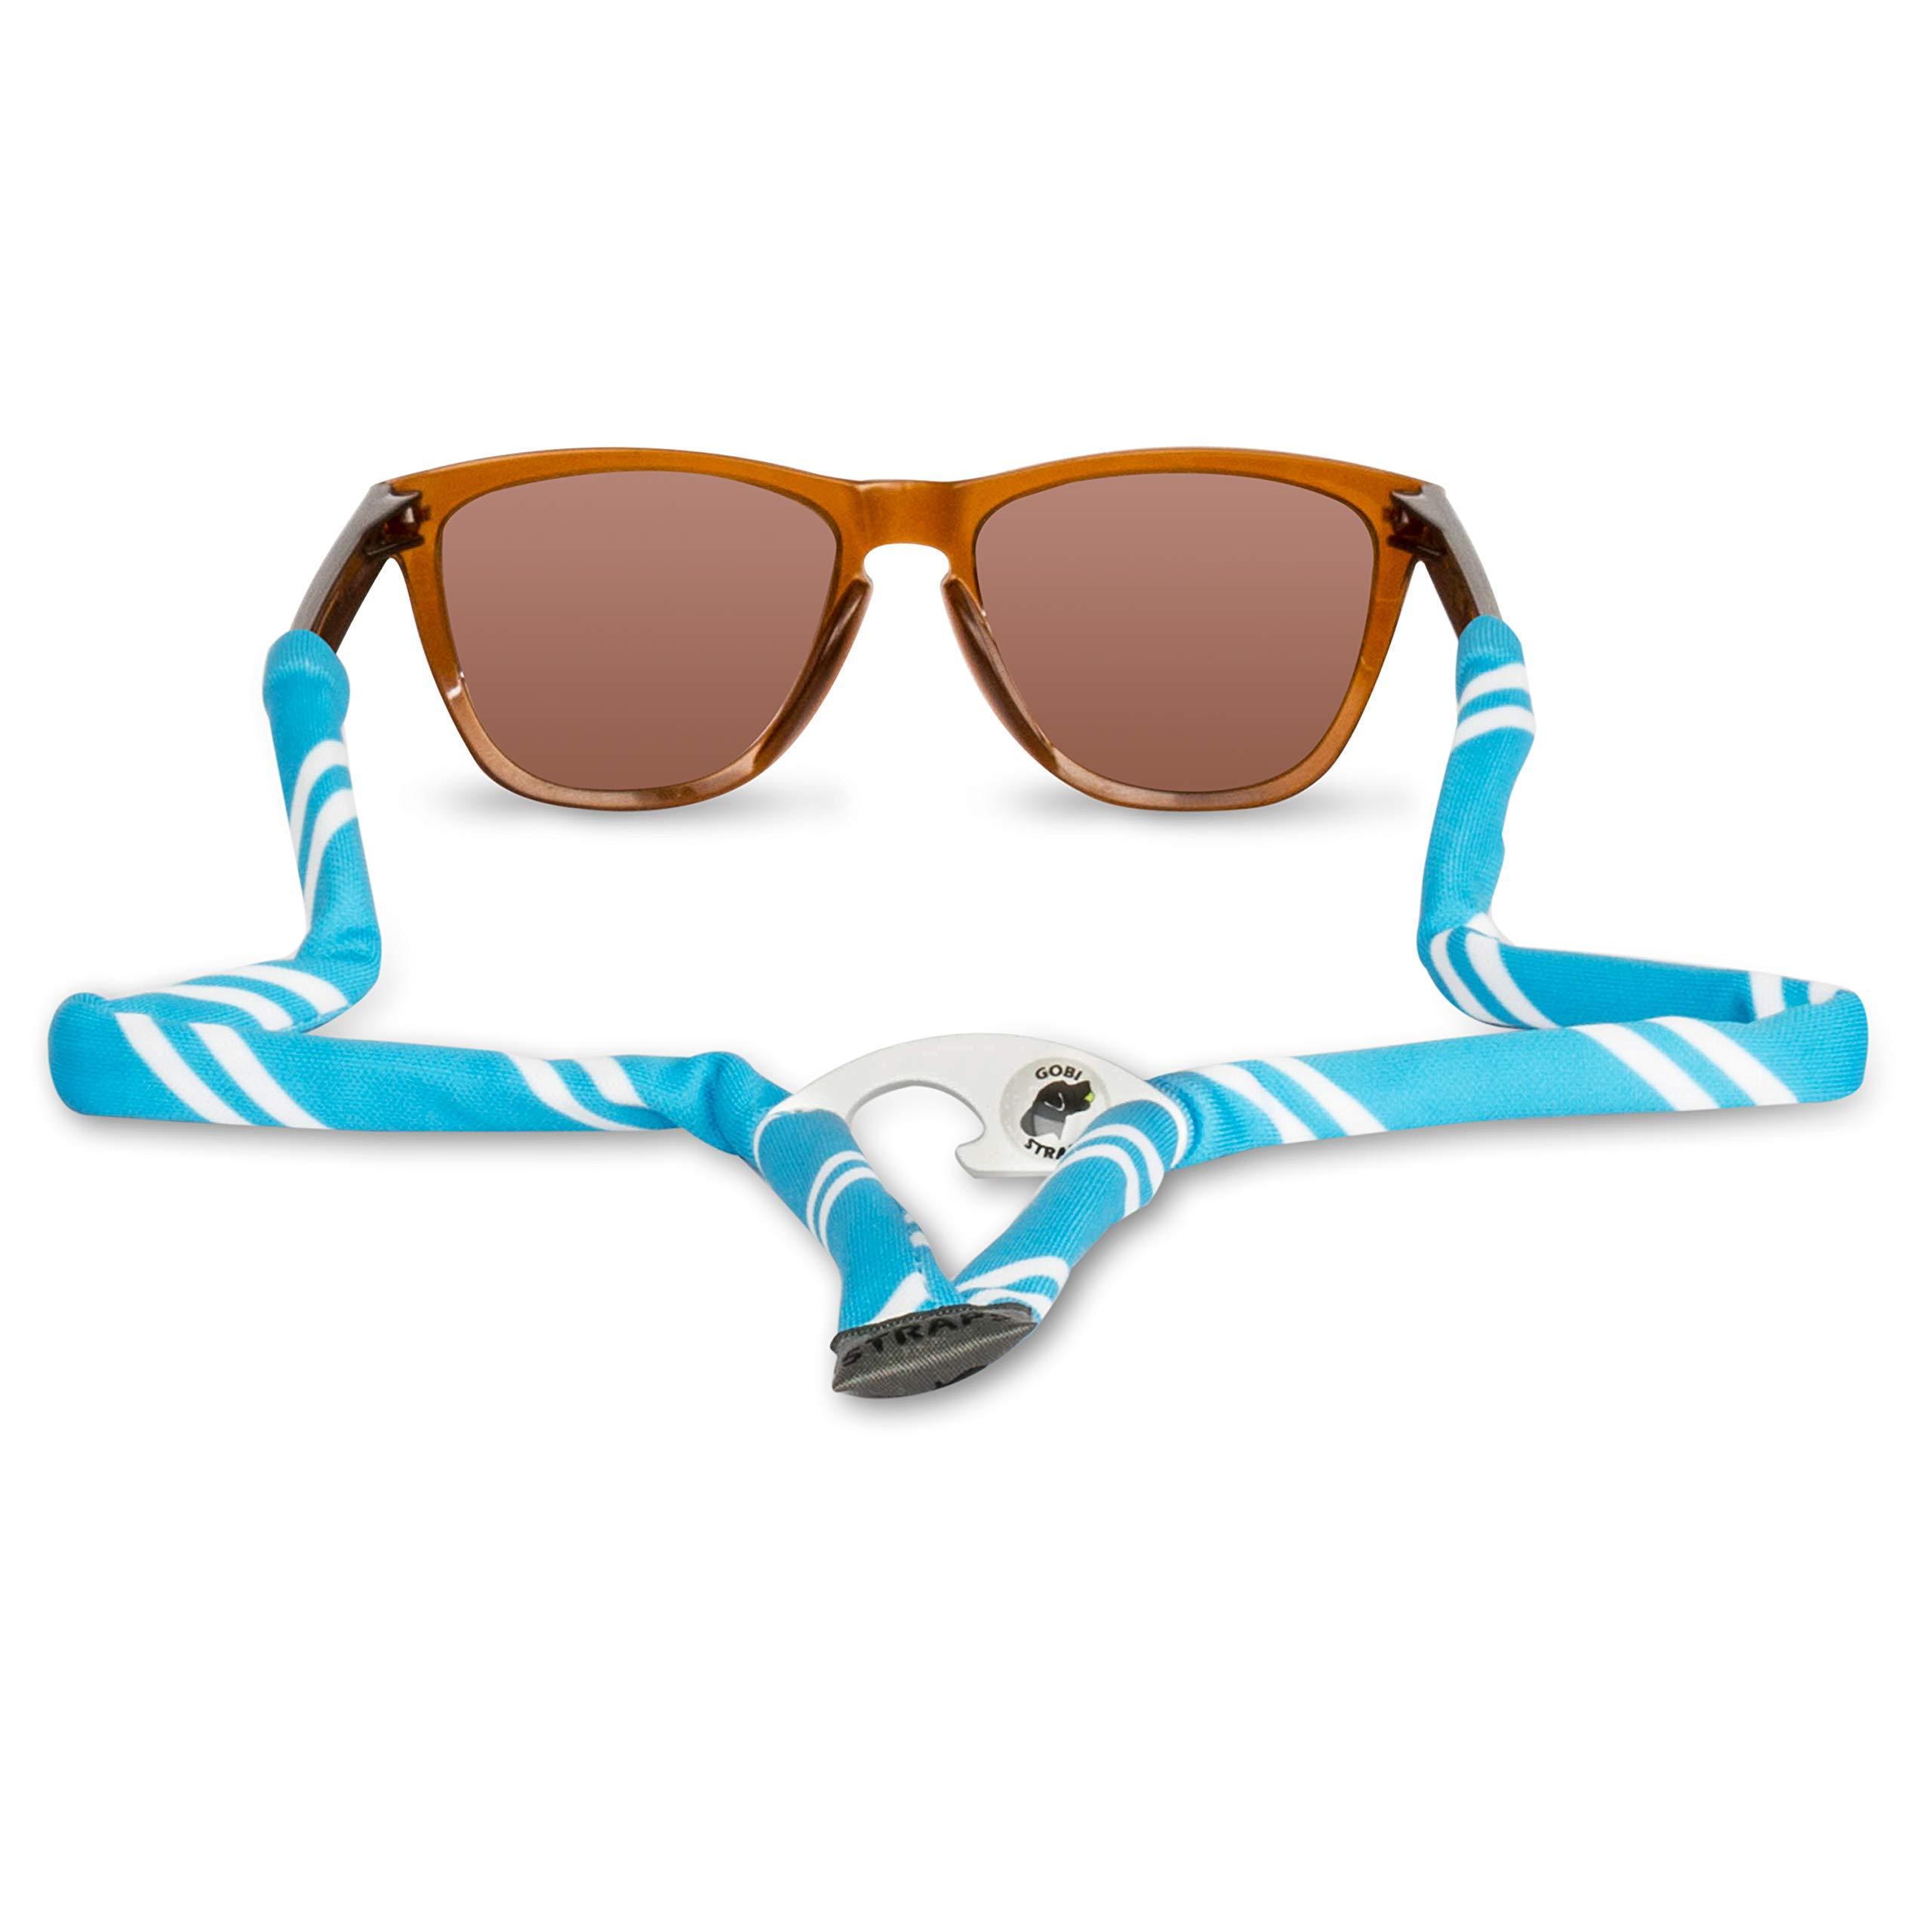 Gobi Straps Sunglass Straps Built-in Bottle Opener | Sunglass Retainers, Sunglass Lanyard, Sunglass Cord | Quick Drying | Powder Blue & White Stripes